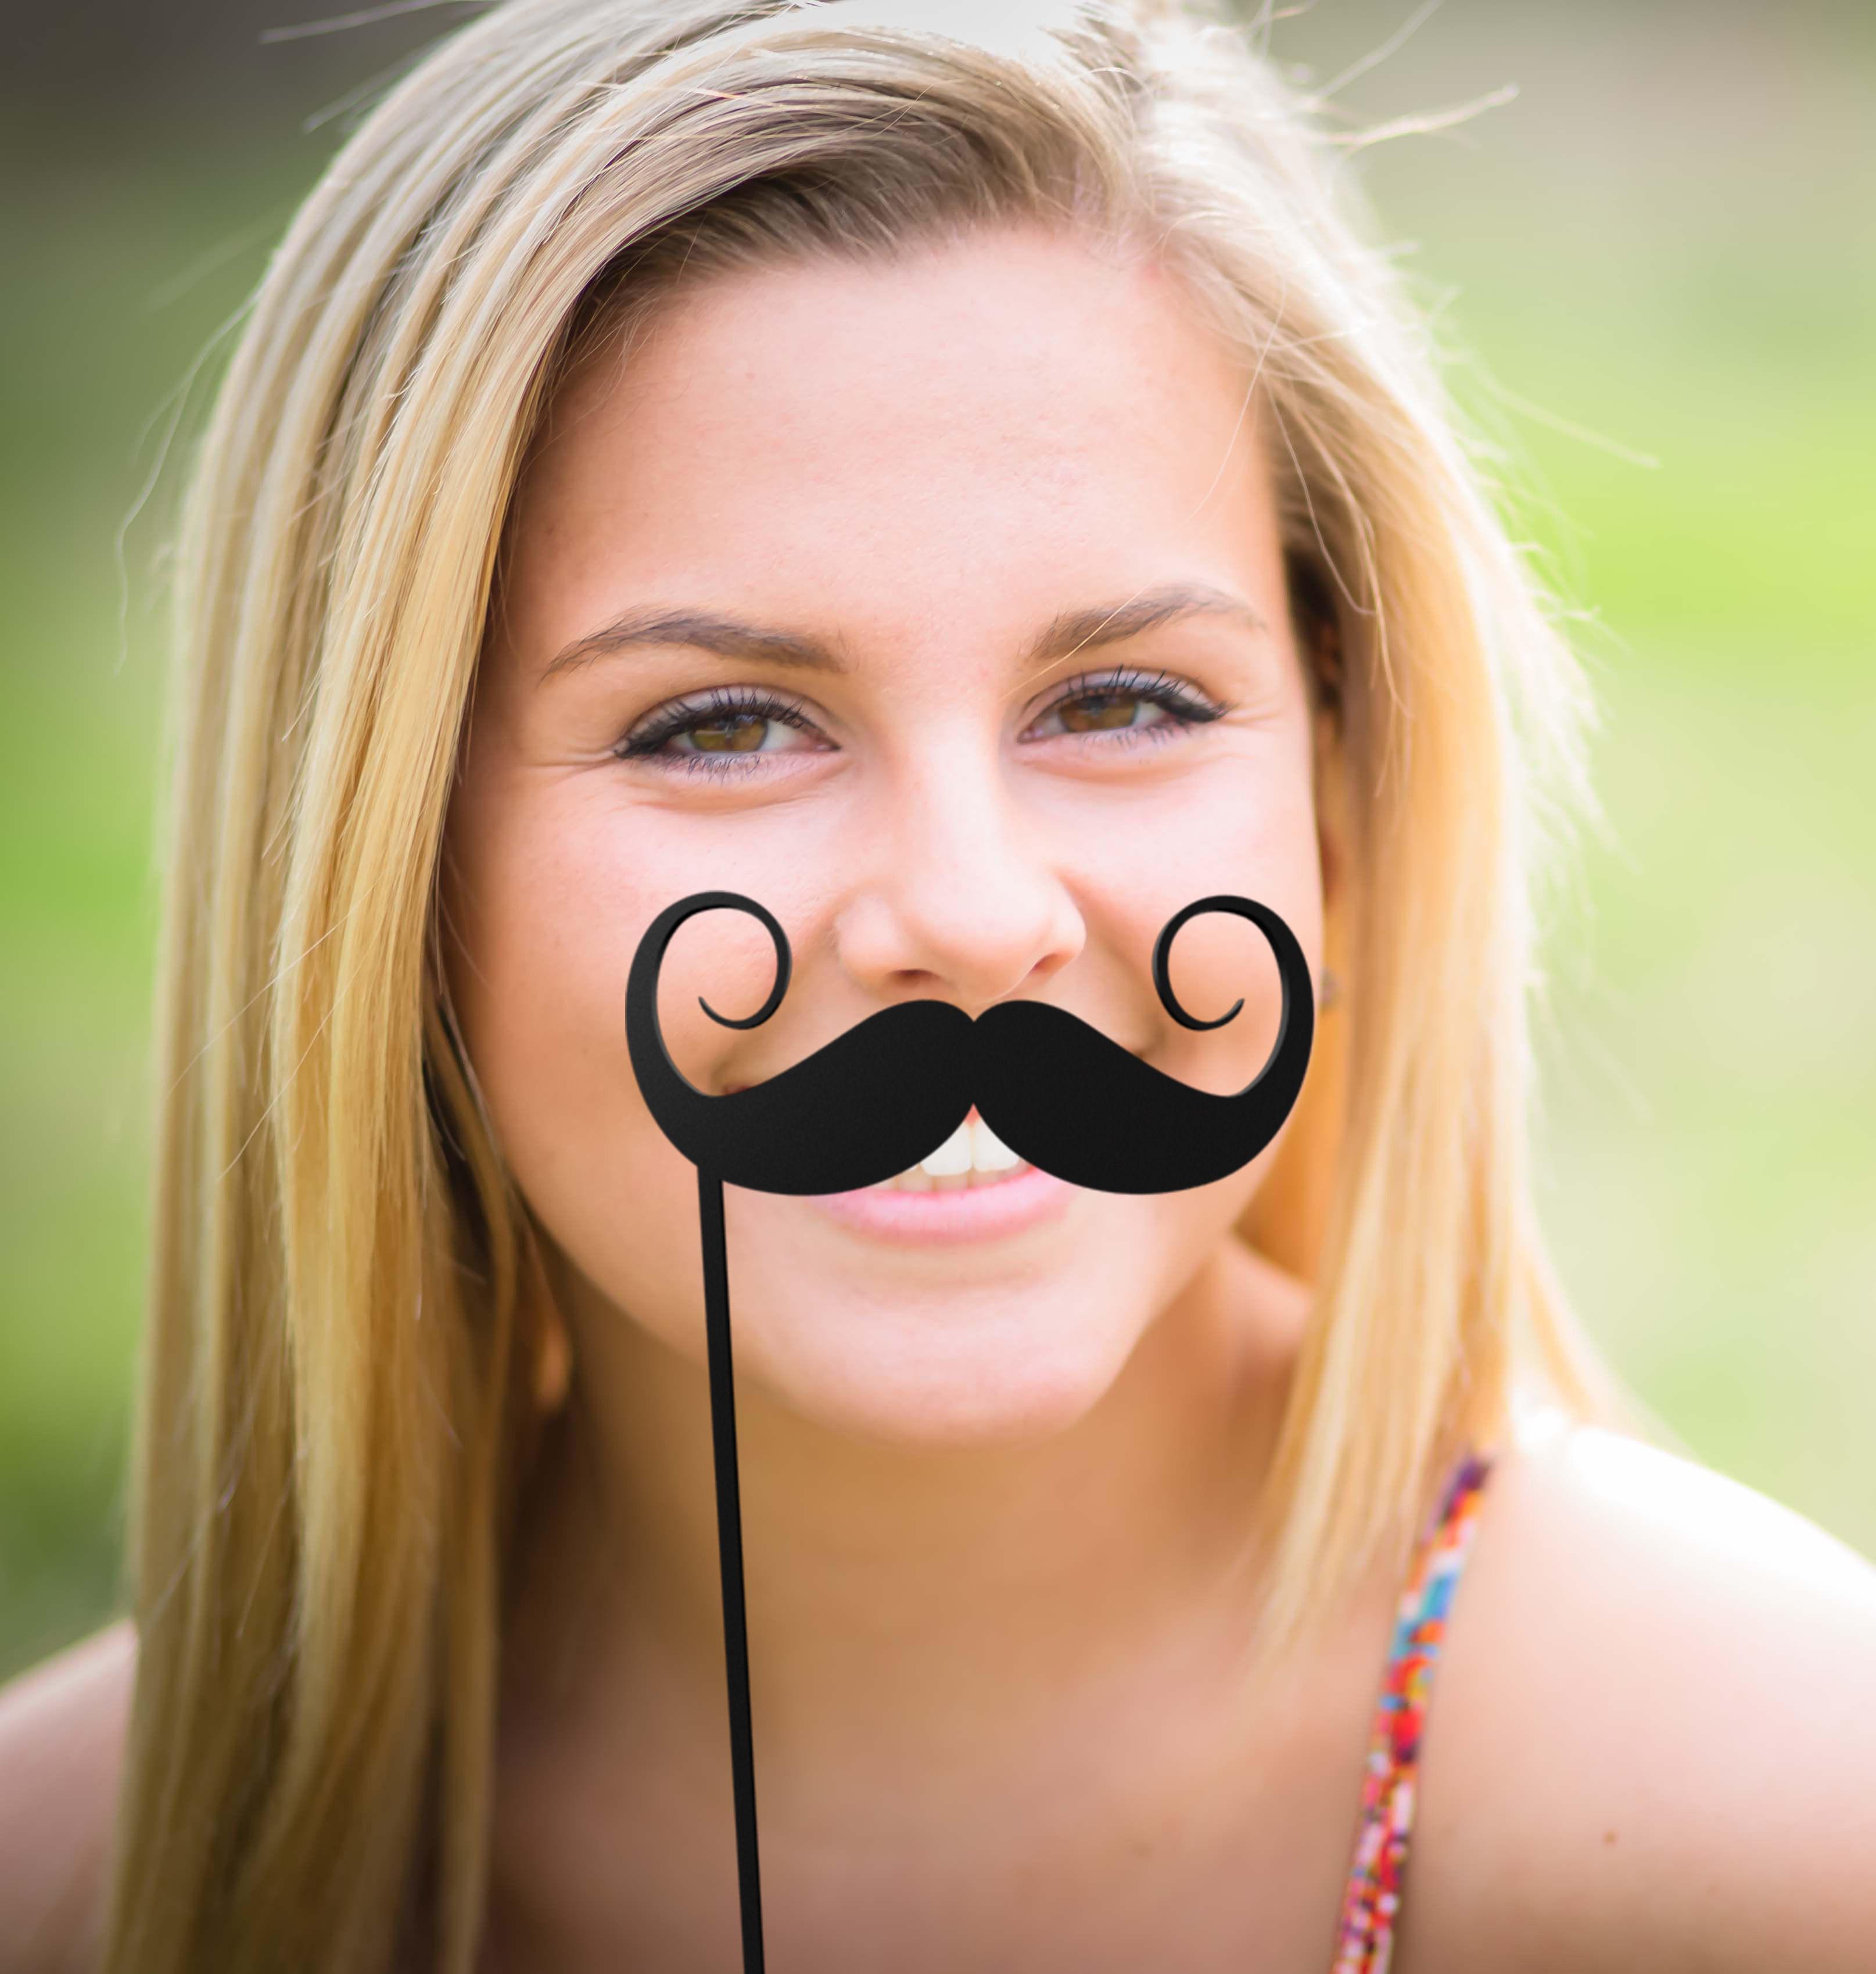 Mustache Mustache Stick